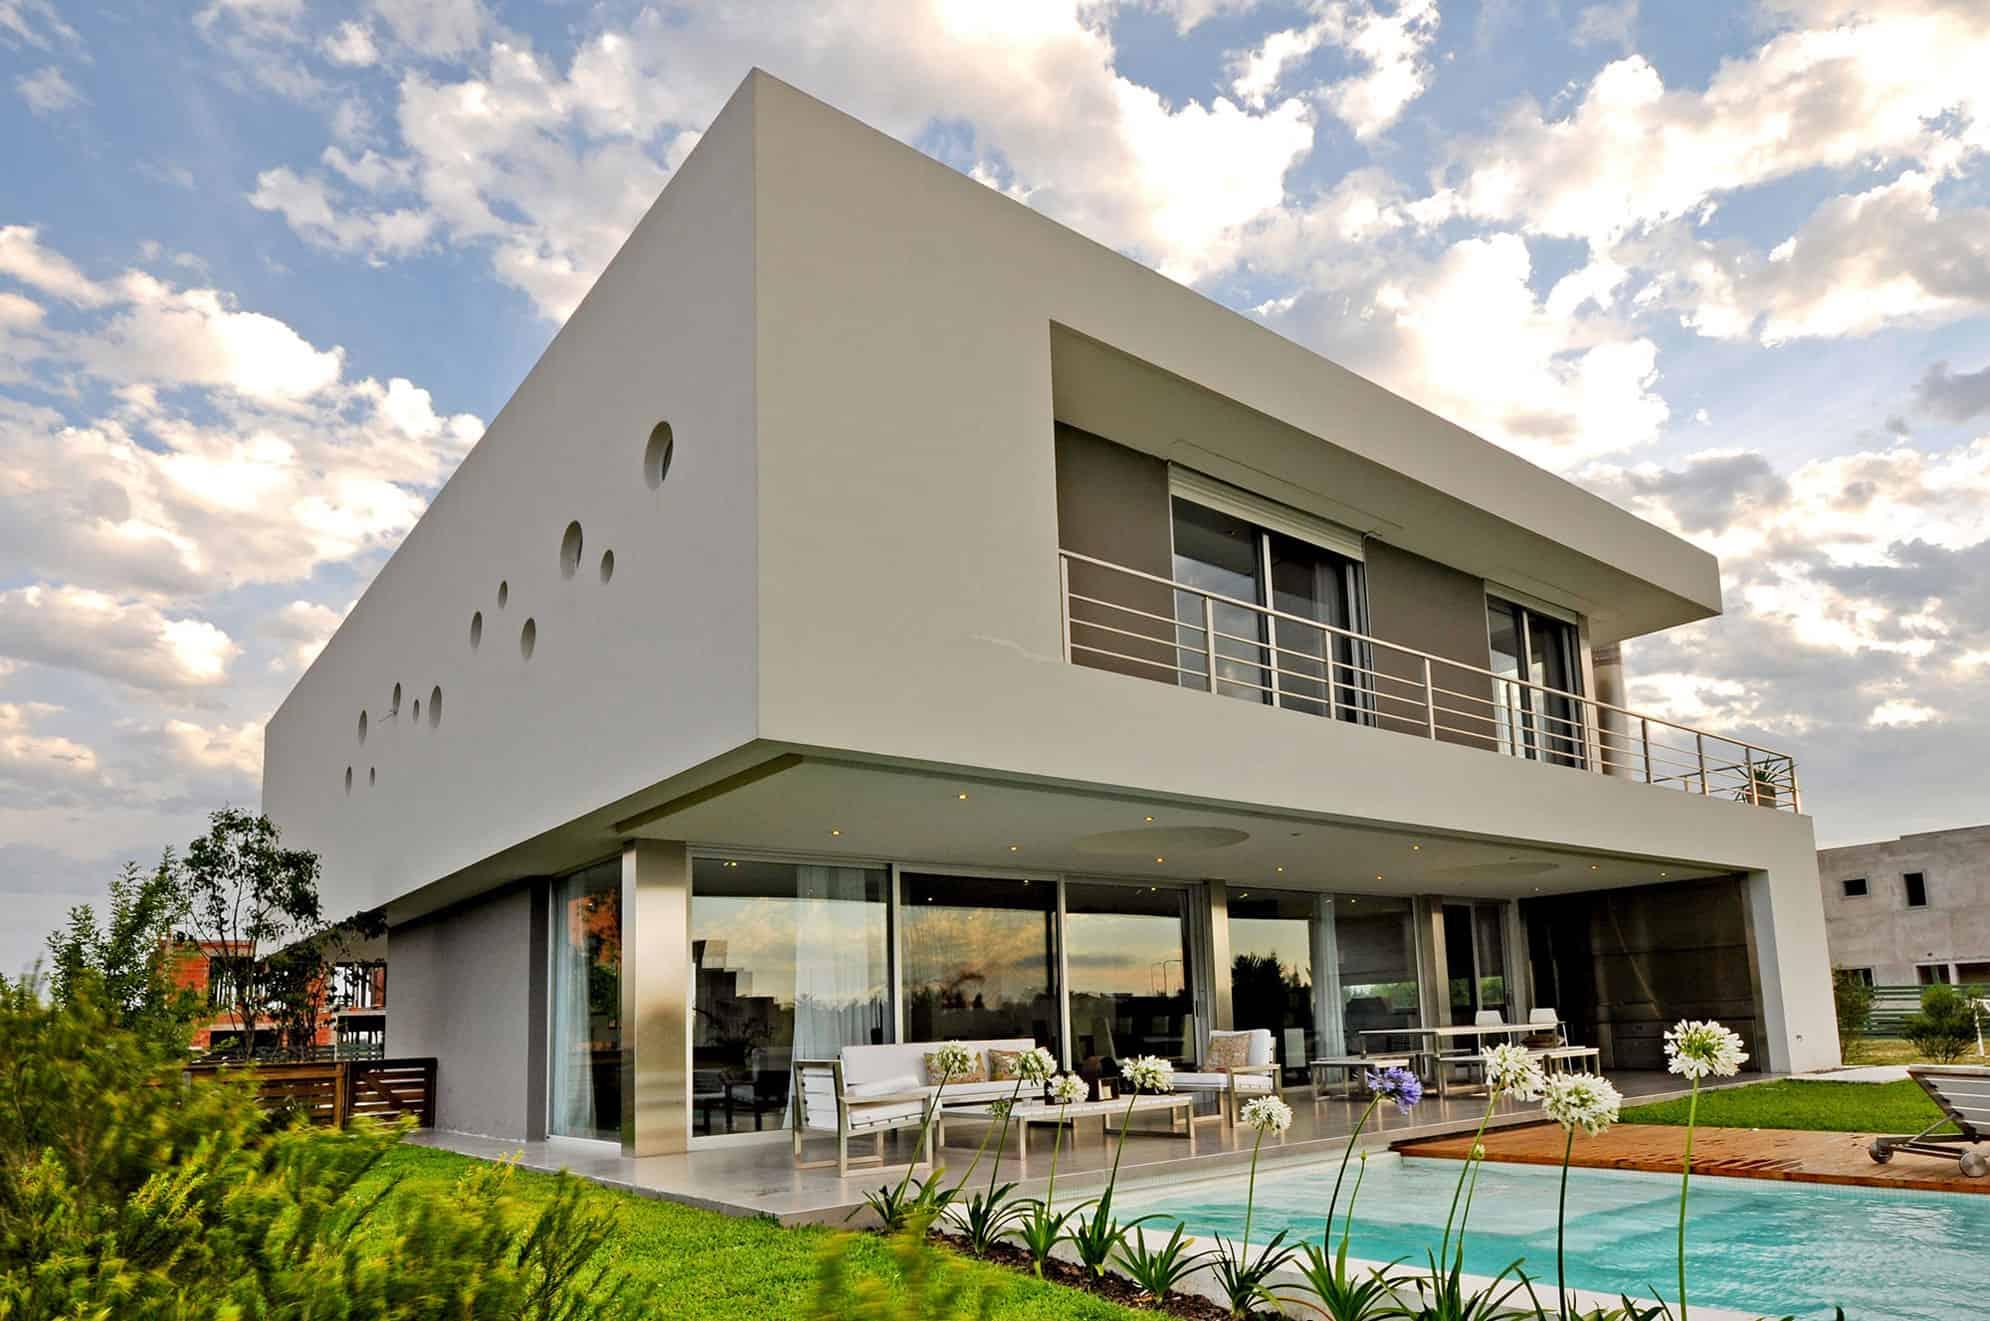 Cabo house by vanguarda architects for Arquitectura de casas minimalistas